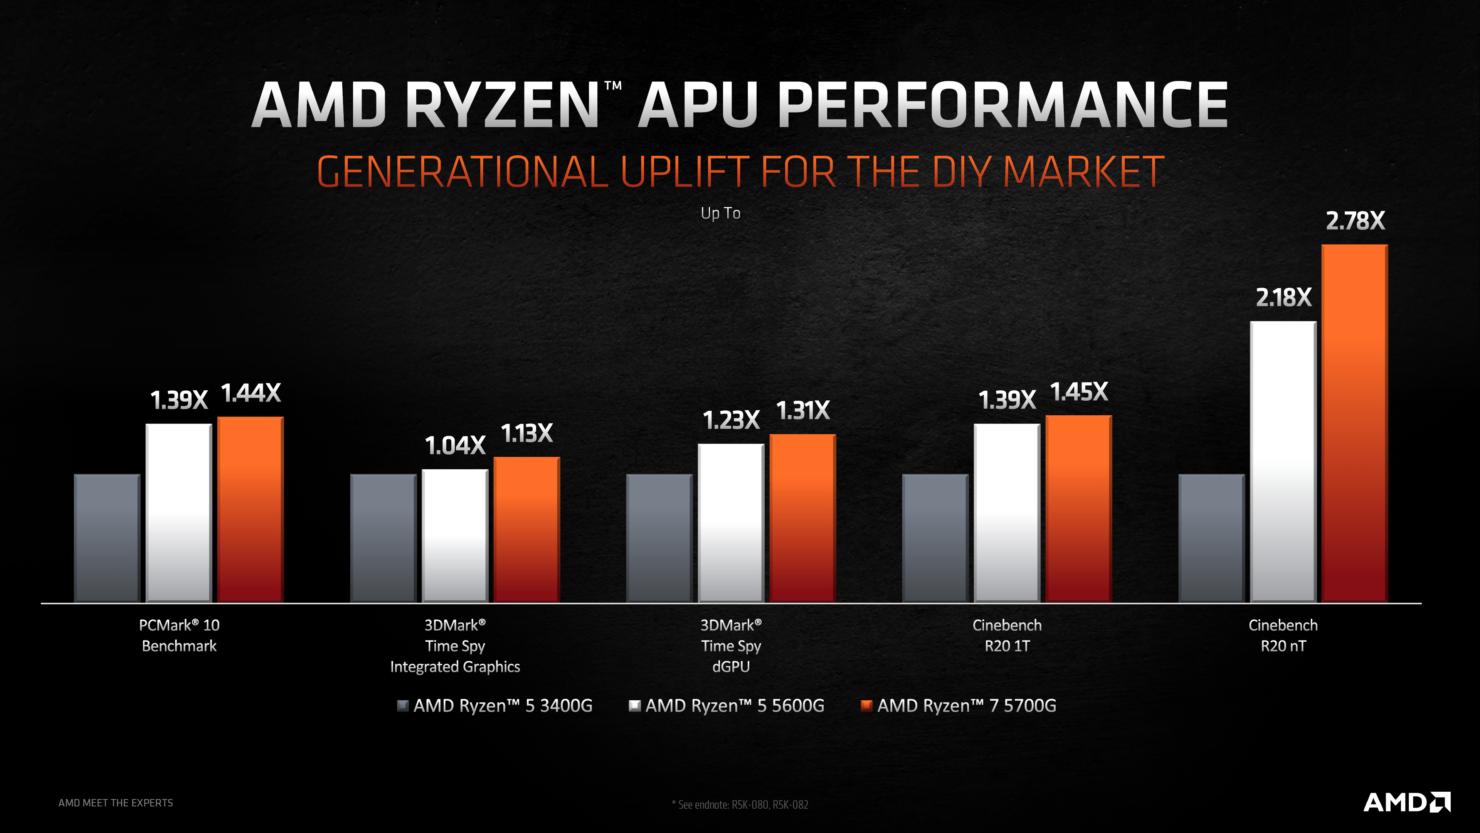 amd-ryzen-5000g-desktop-apus-launch-_-ryzen-7-5700g-ryzen-5-5600g-_4